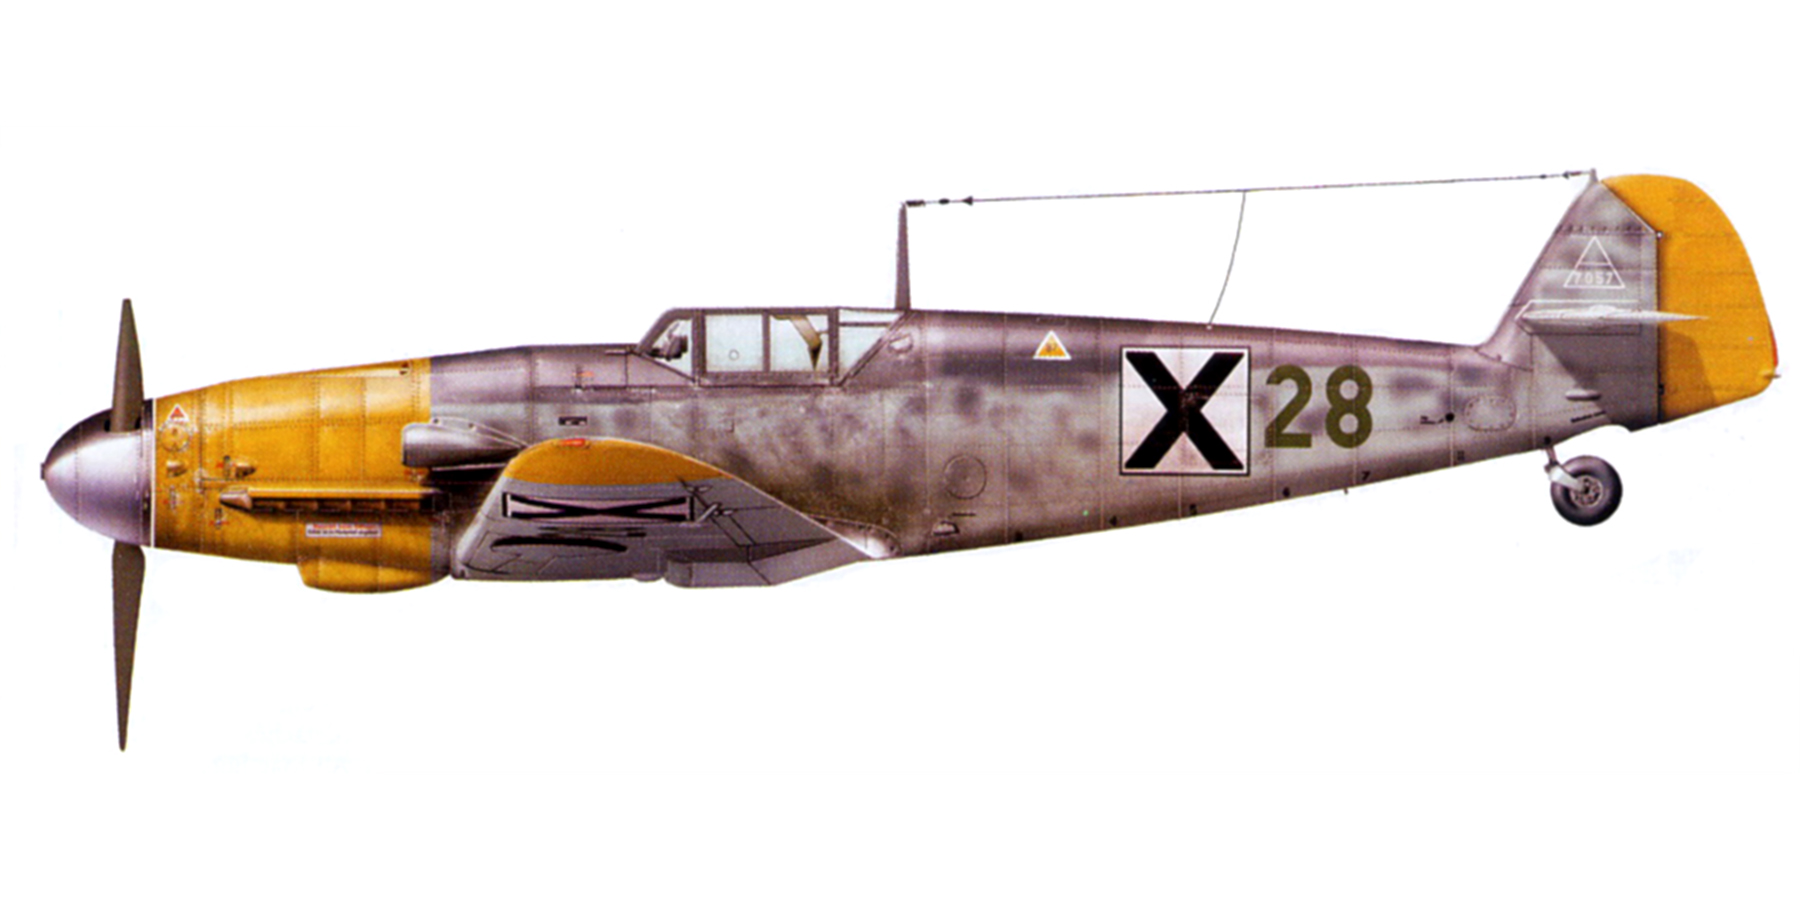 Messerschmitt Bf 109G2 RBuAF 682e escadrille 3.6 groupe Black 28 Stoyan Stoyanaov Karlovo 1943 0A